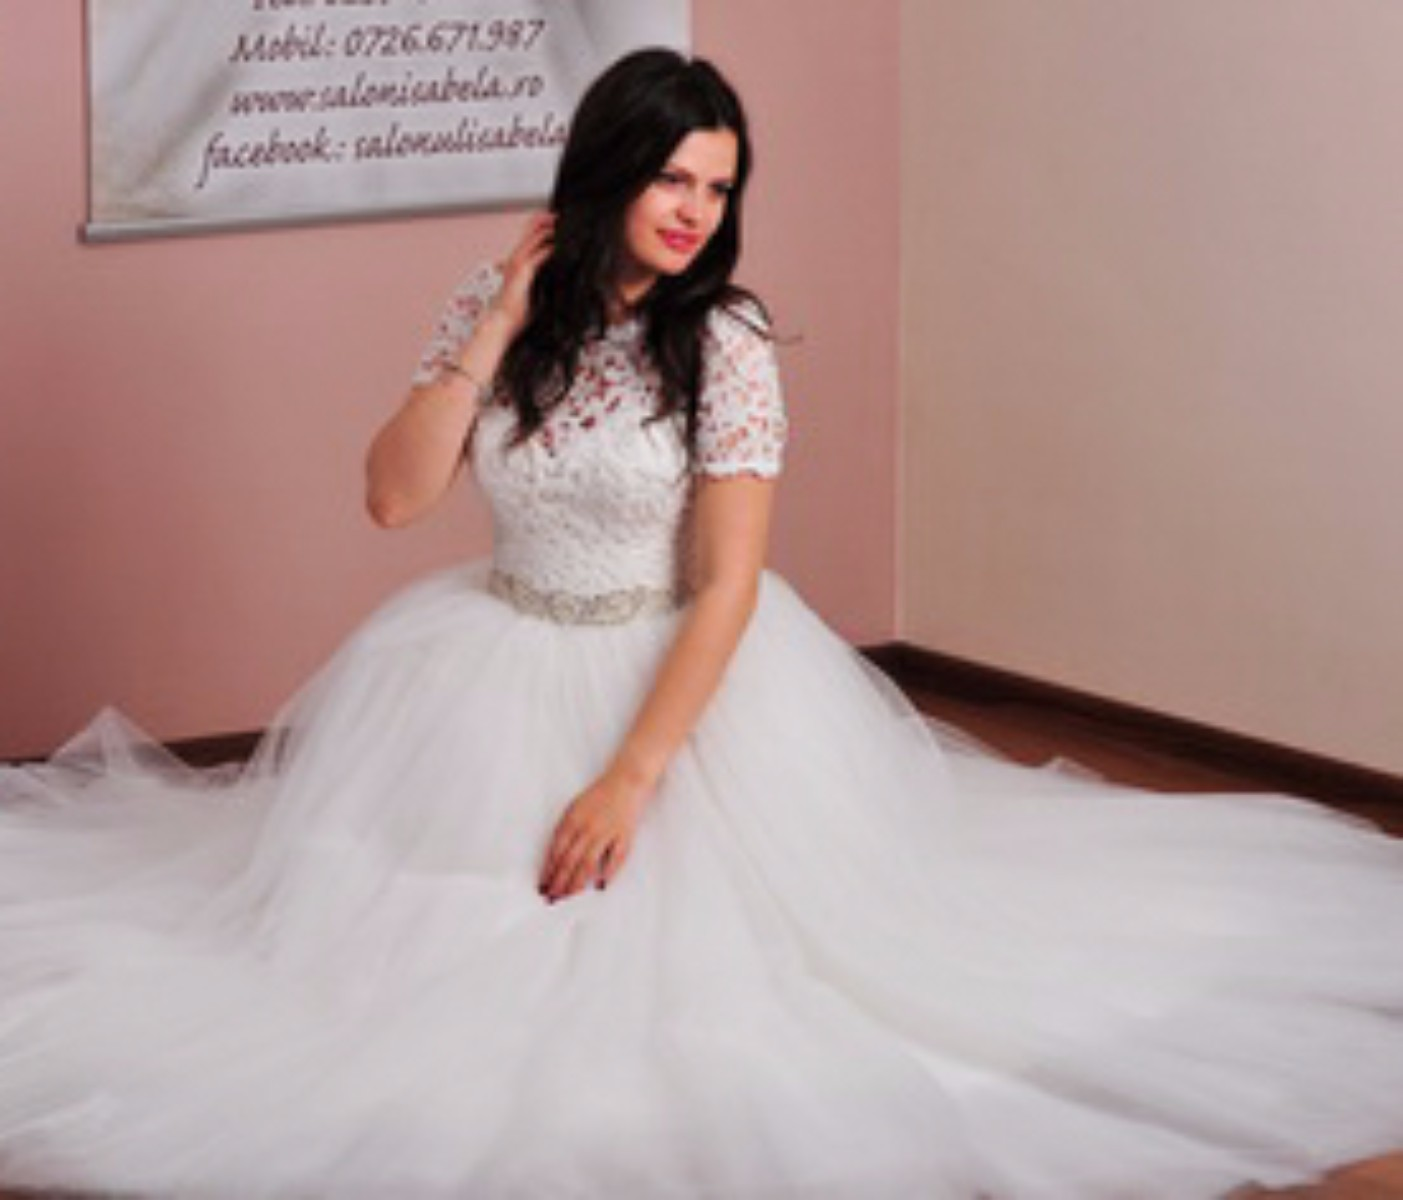 Isabel calea belladonna